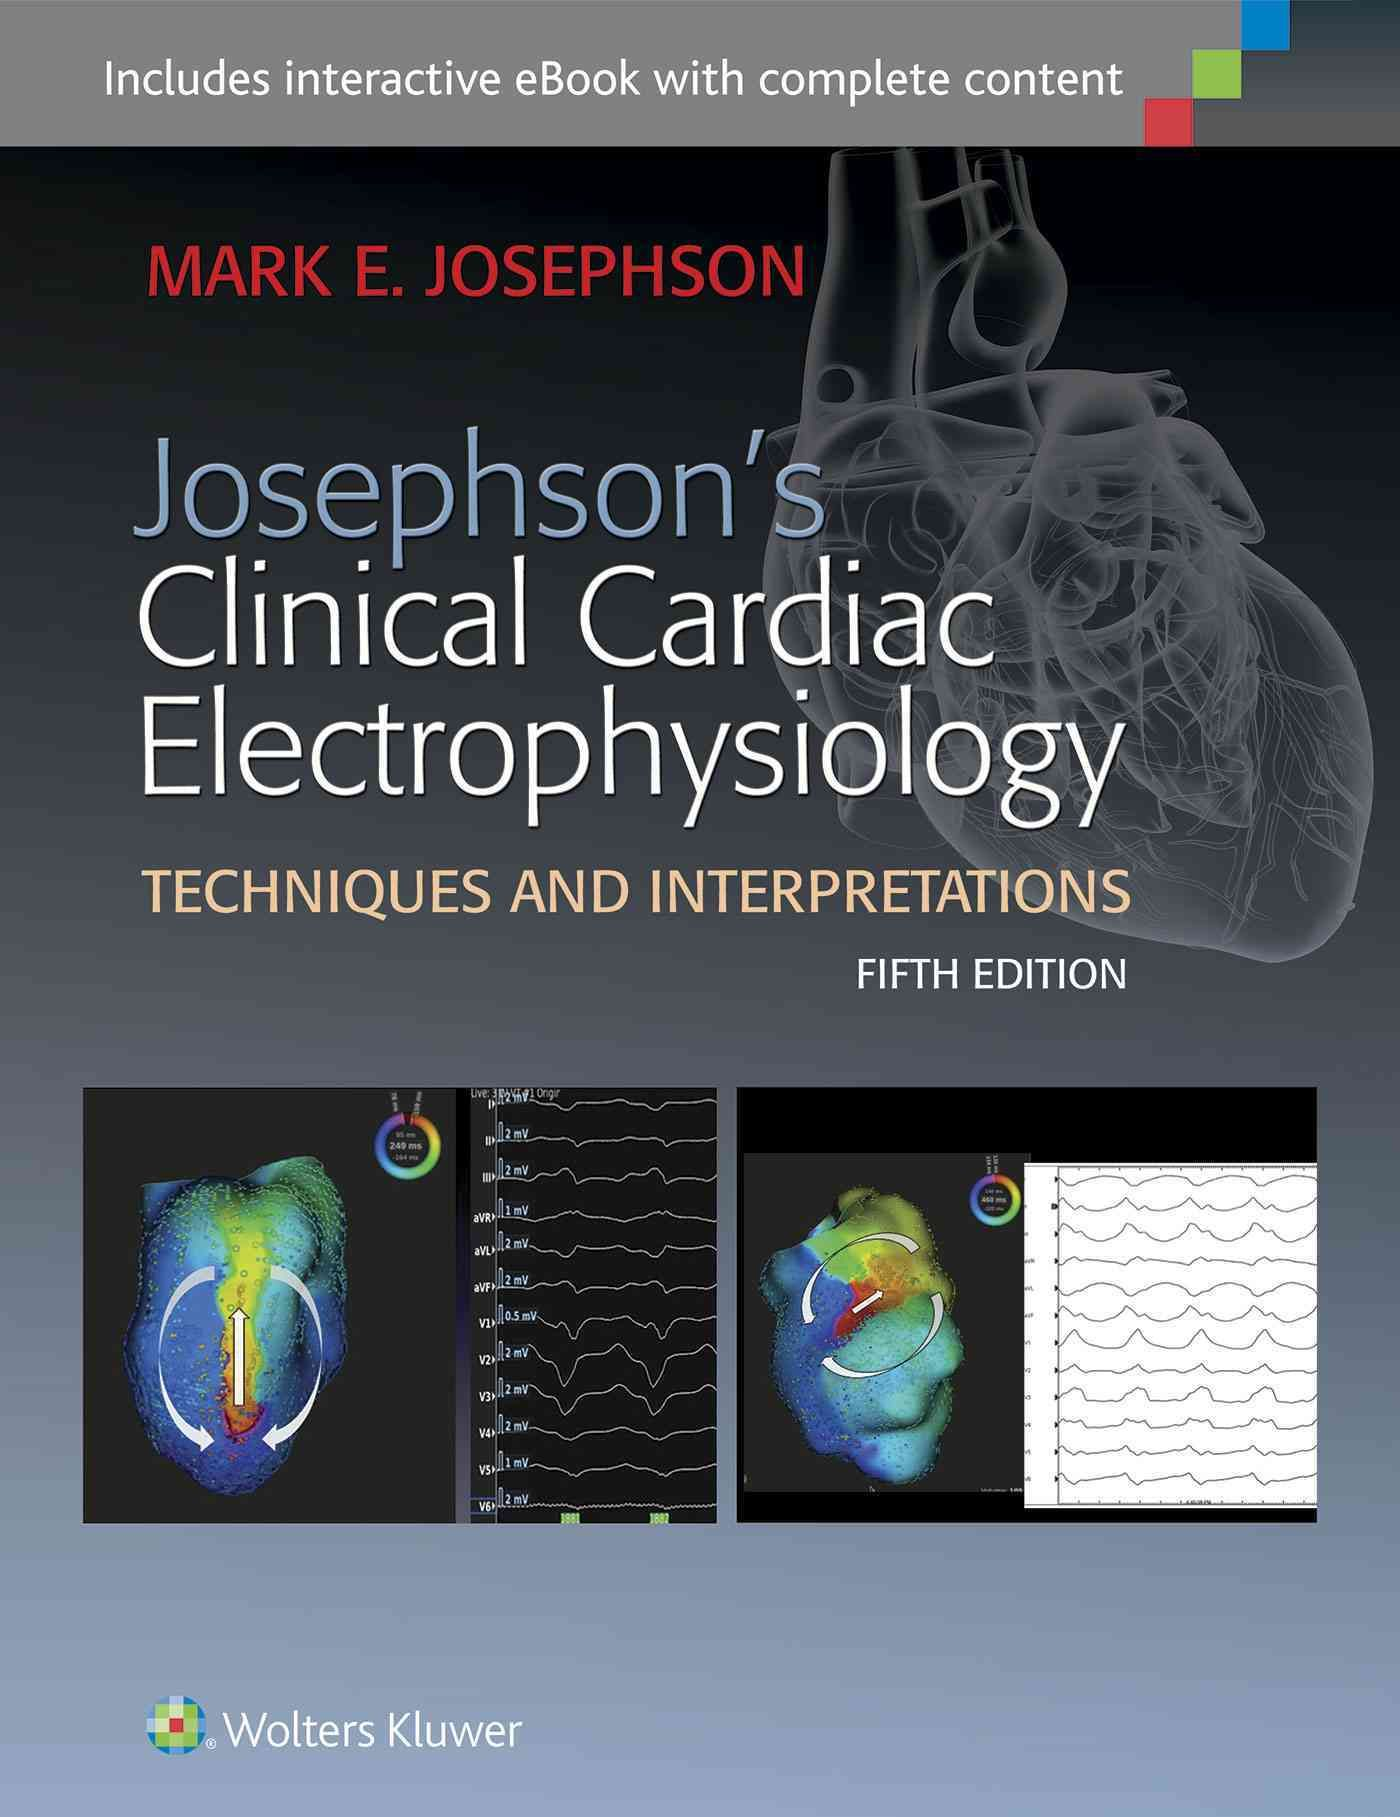 Josephson's Clinical Cardiac Electrophysiology Techniques